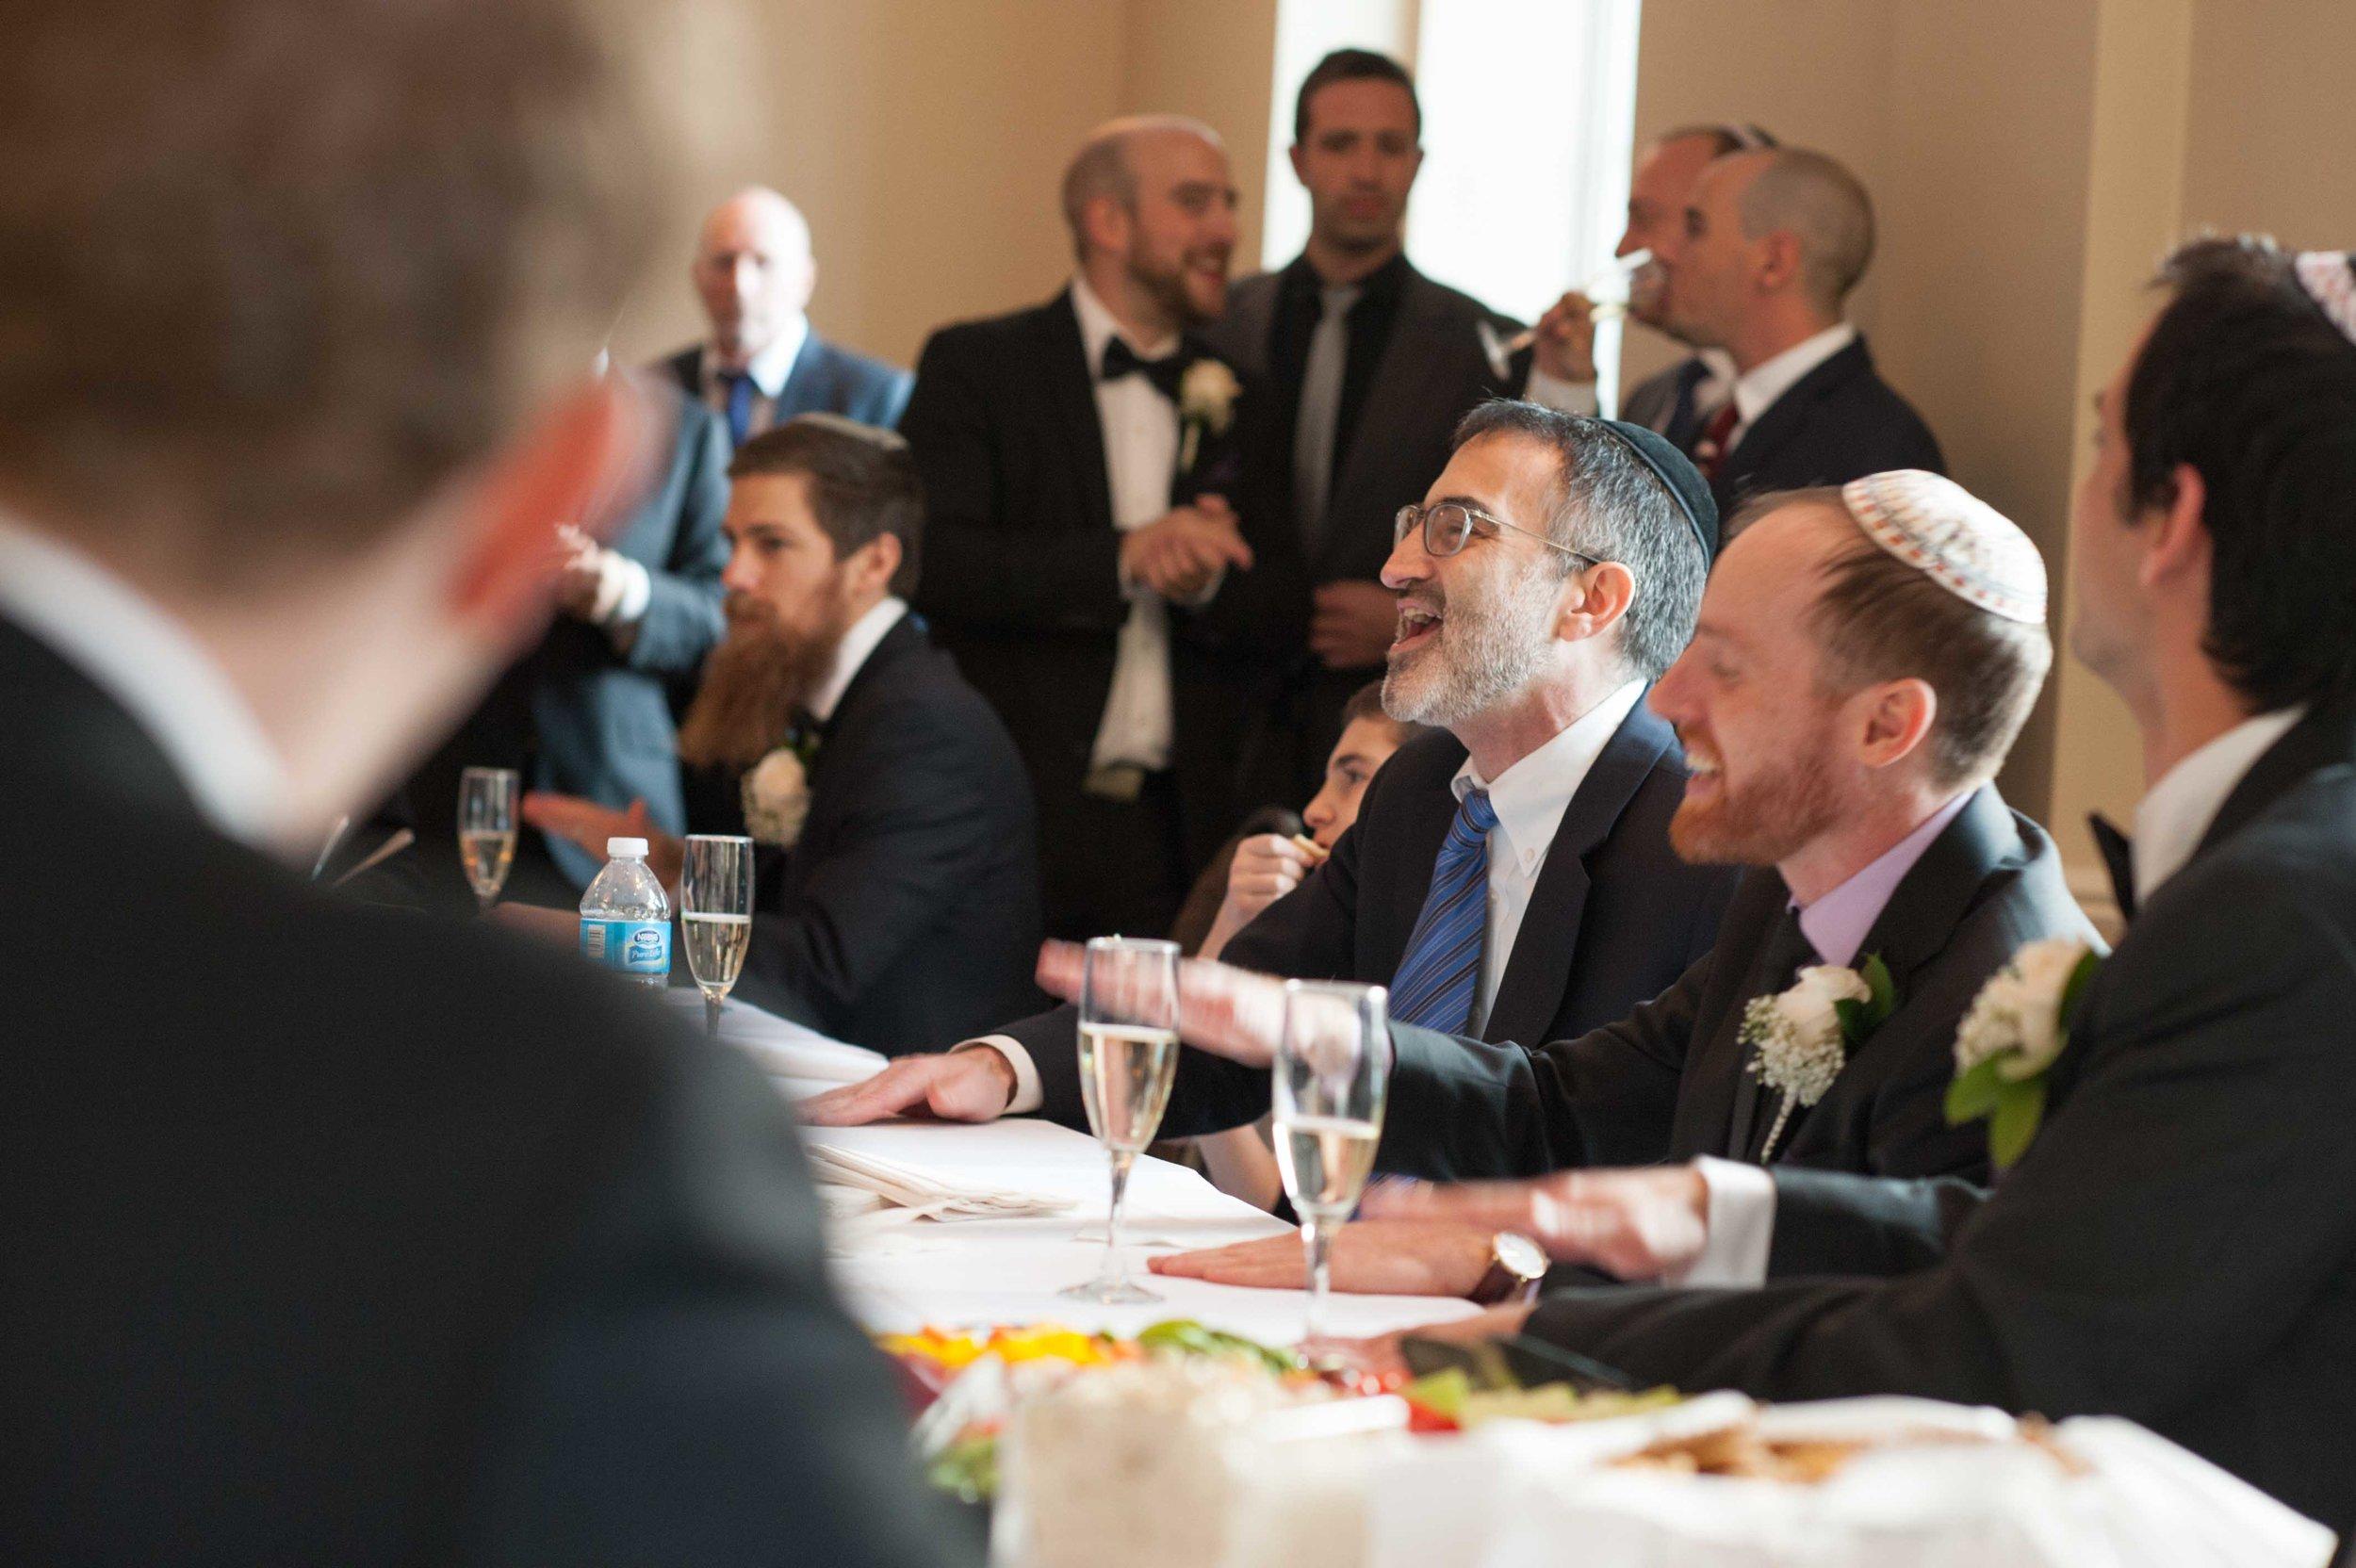 wedding photographer minneapolis mn